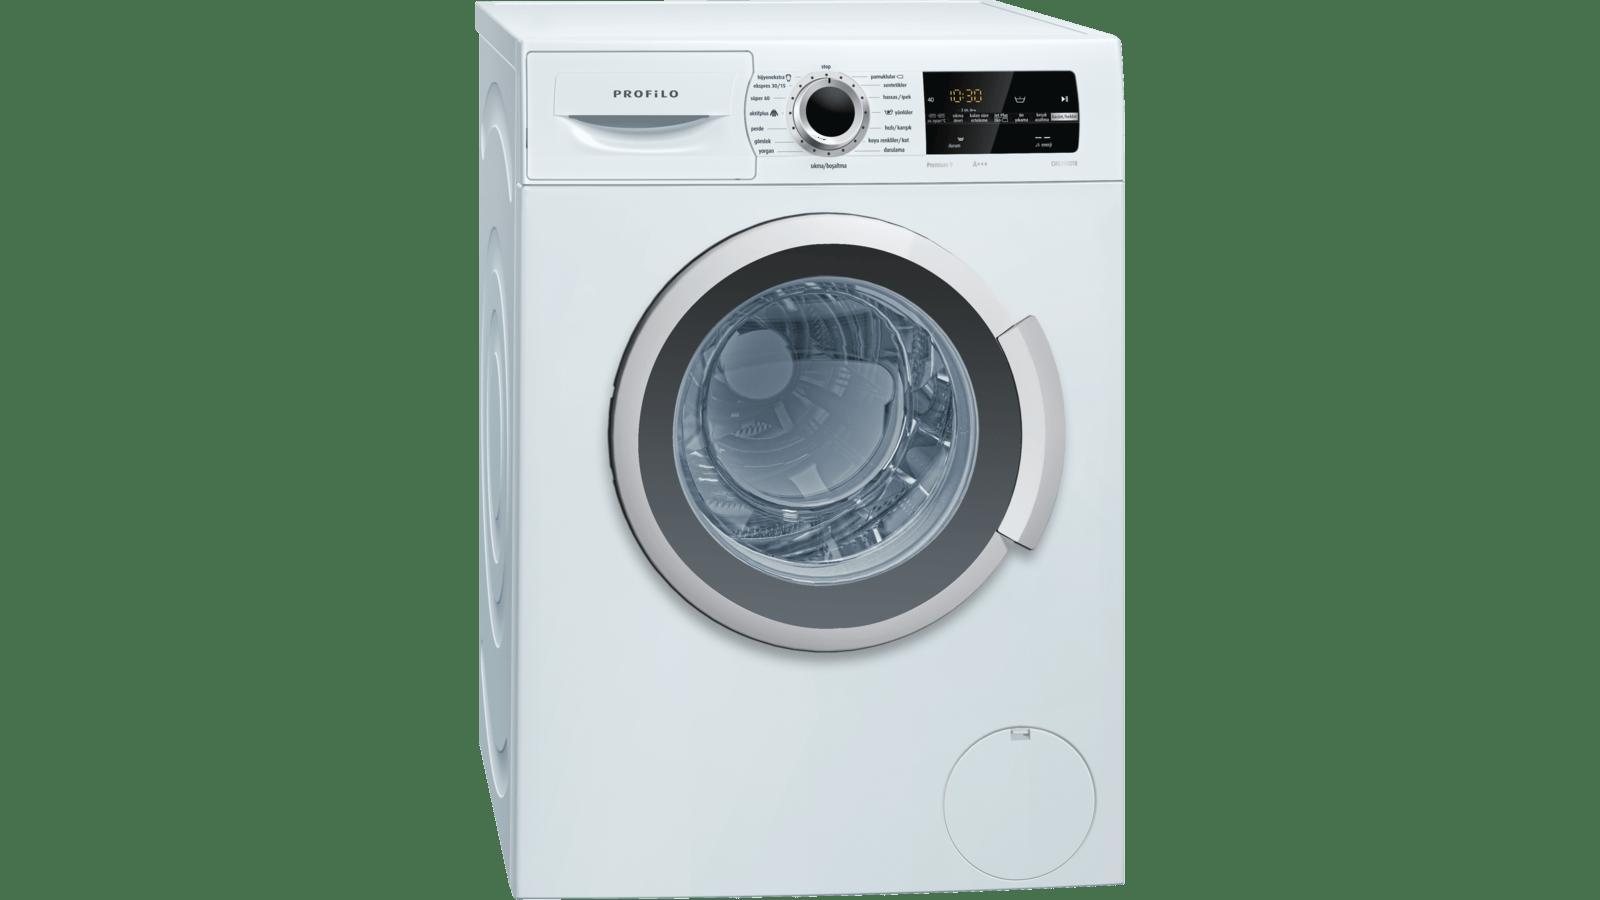 Camasir Makinesi 9 Kg 1000 Devir A Cmg100dtr Profilo